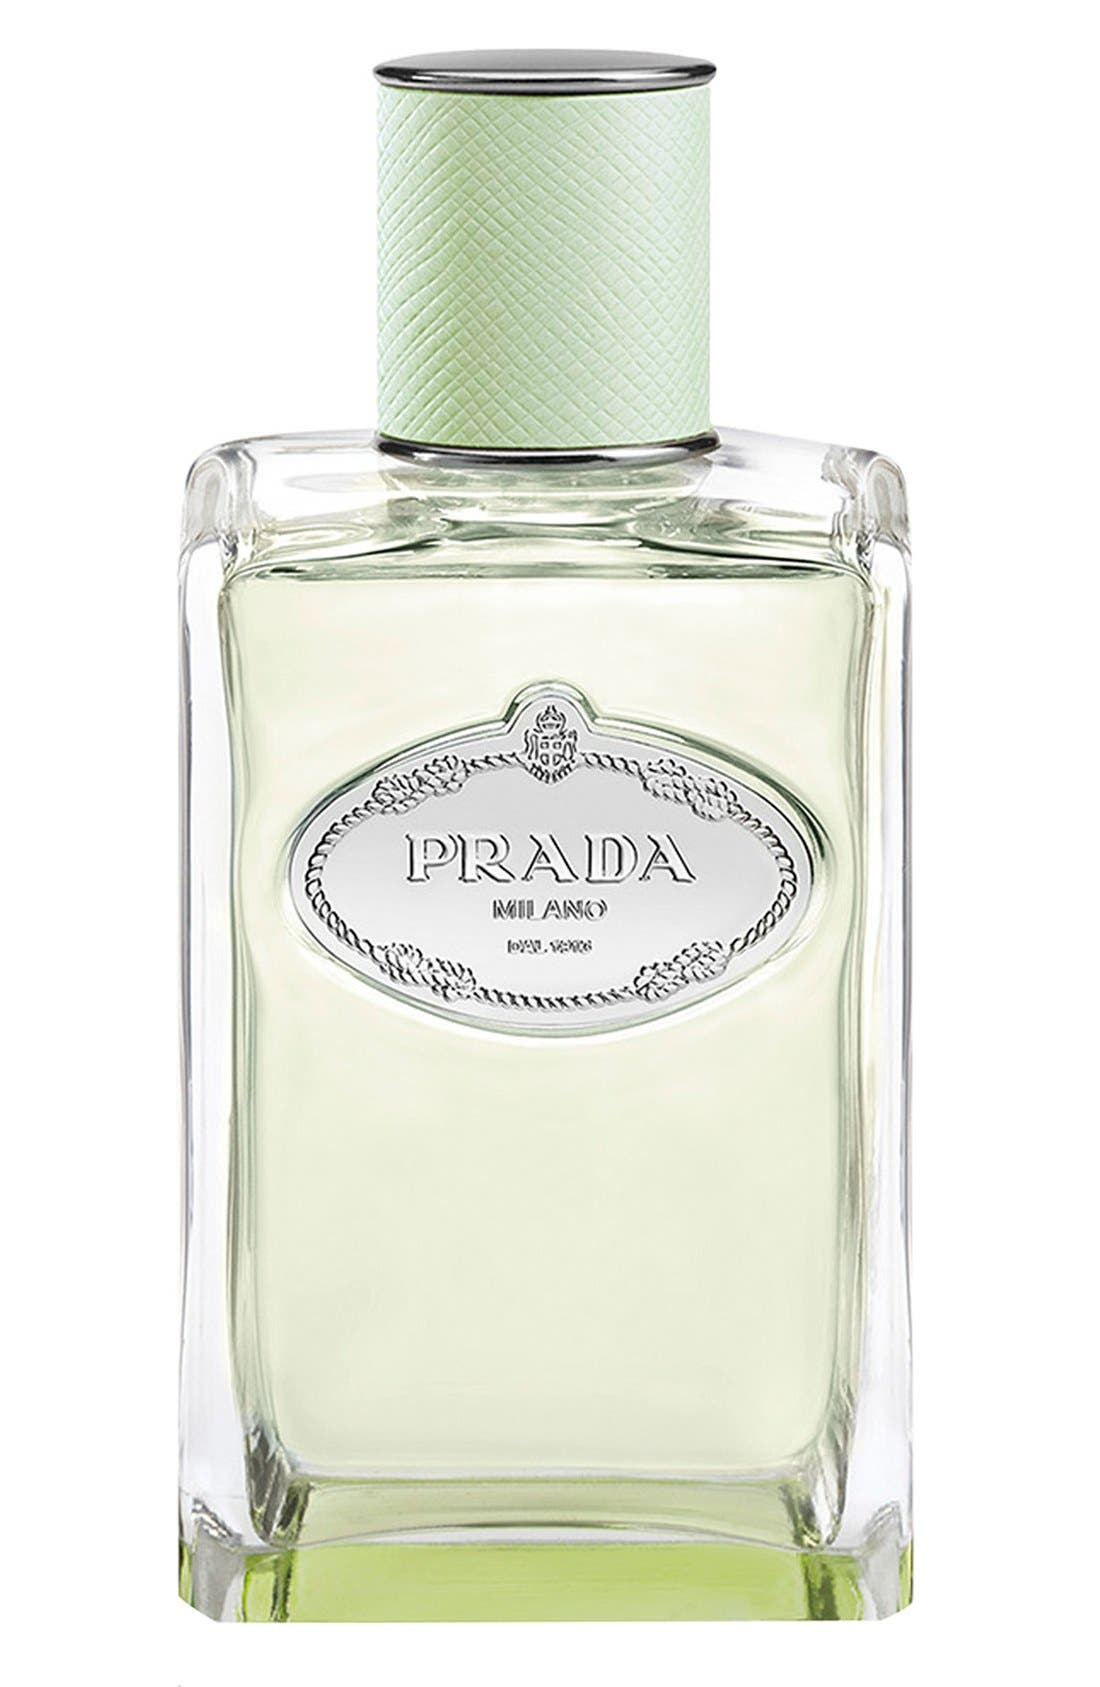 Prada Les Infusions d'Iris Eau de Parfum